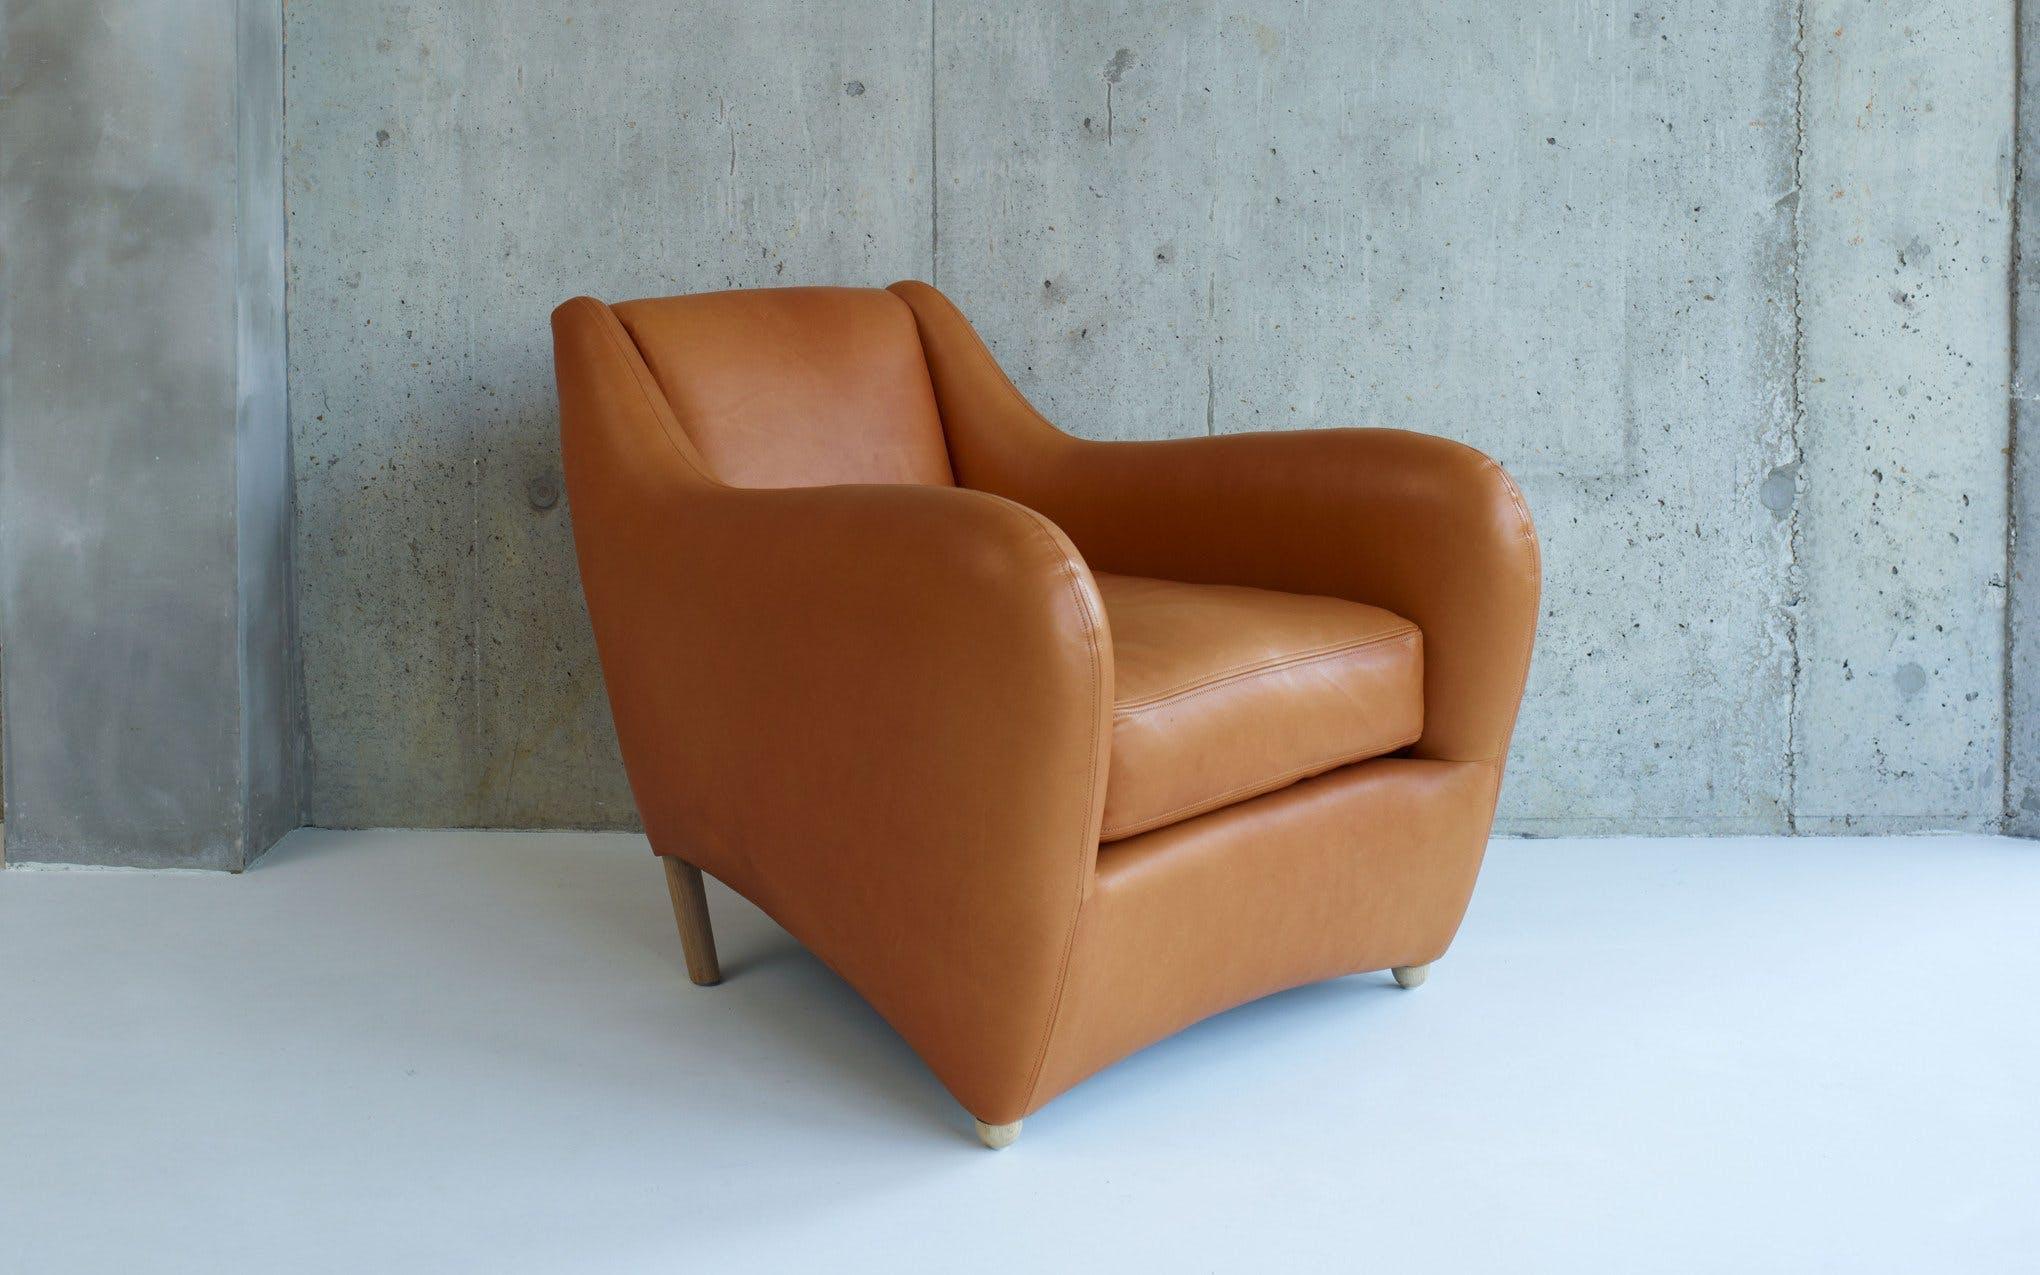 Balzac Armchair By Matthew Hilton For Scp 2 2048X2048